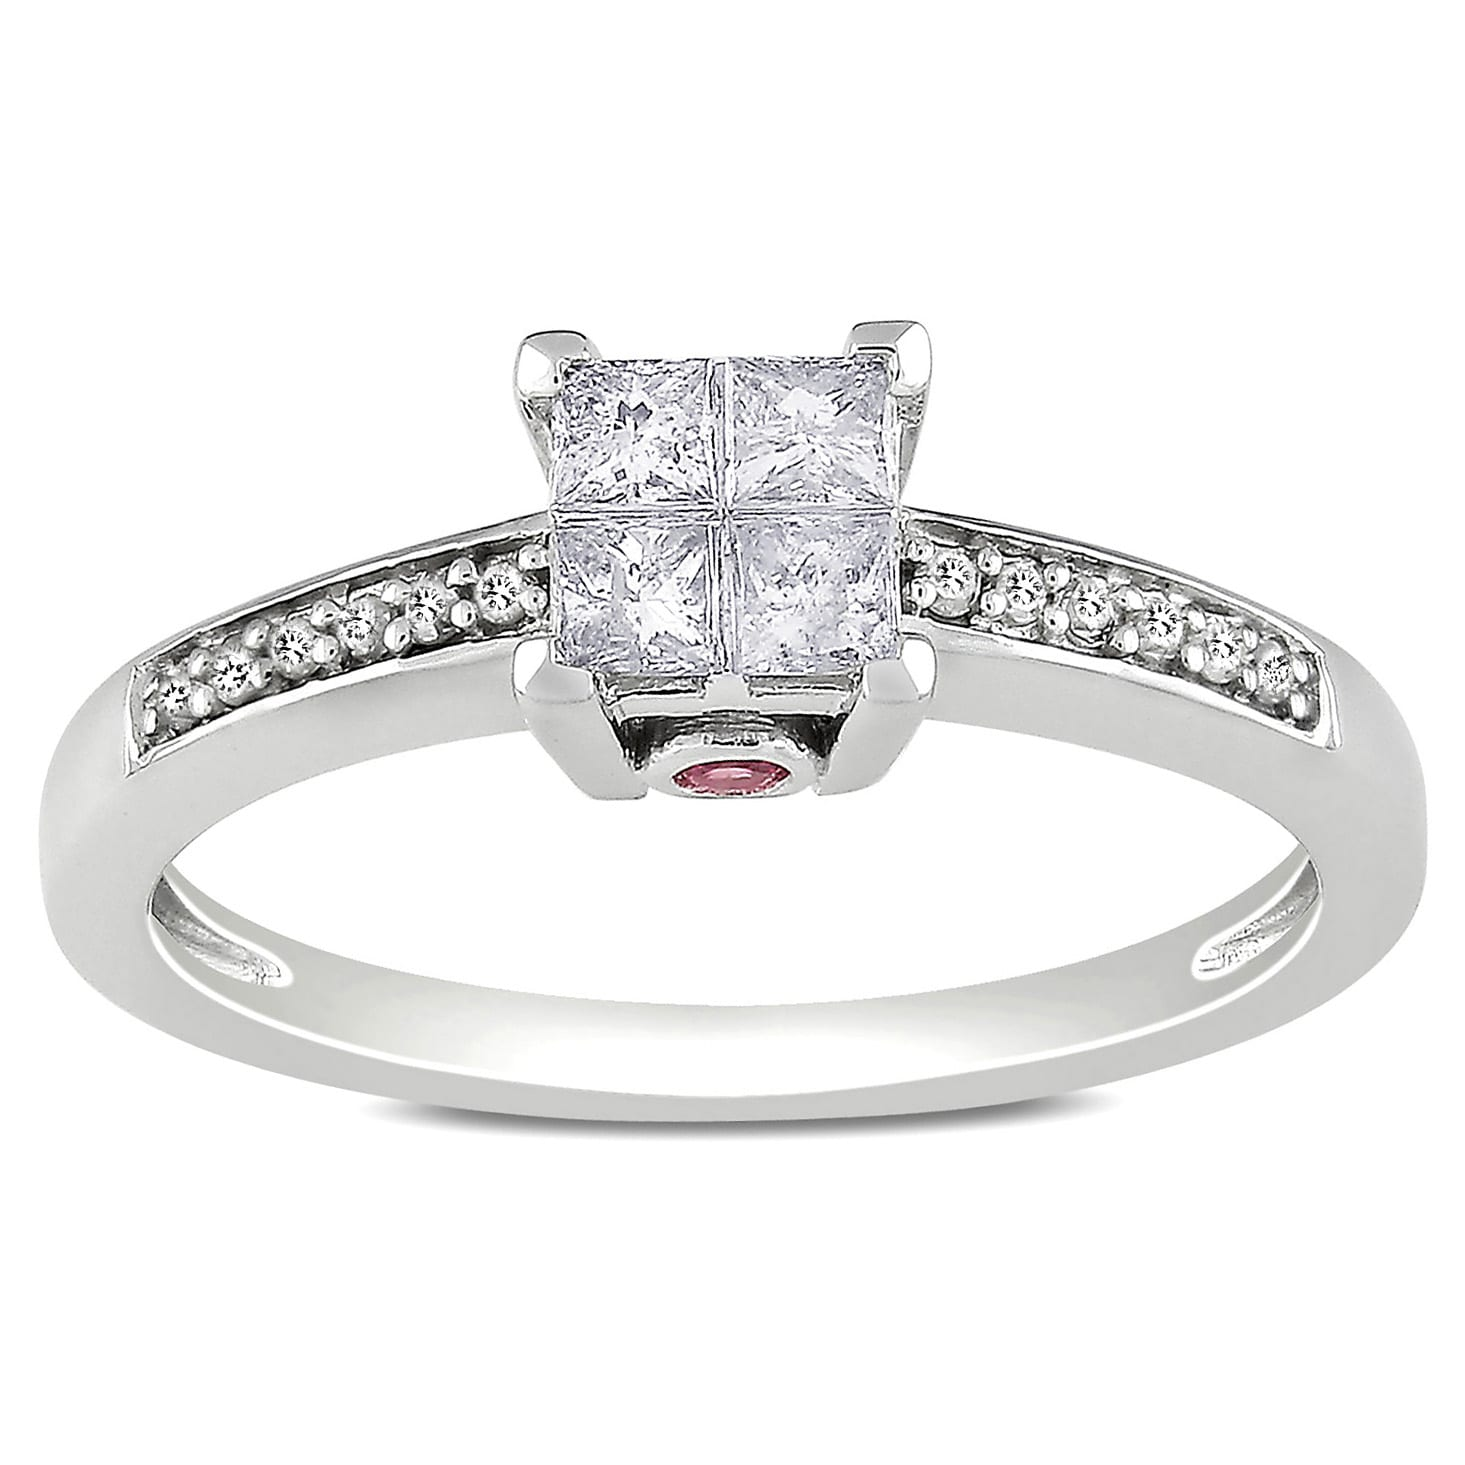 Miadora 14k White Gold 1/3ct TDW Diamond and Pink Sapphire Ring (H-I, I2-I3)